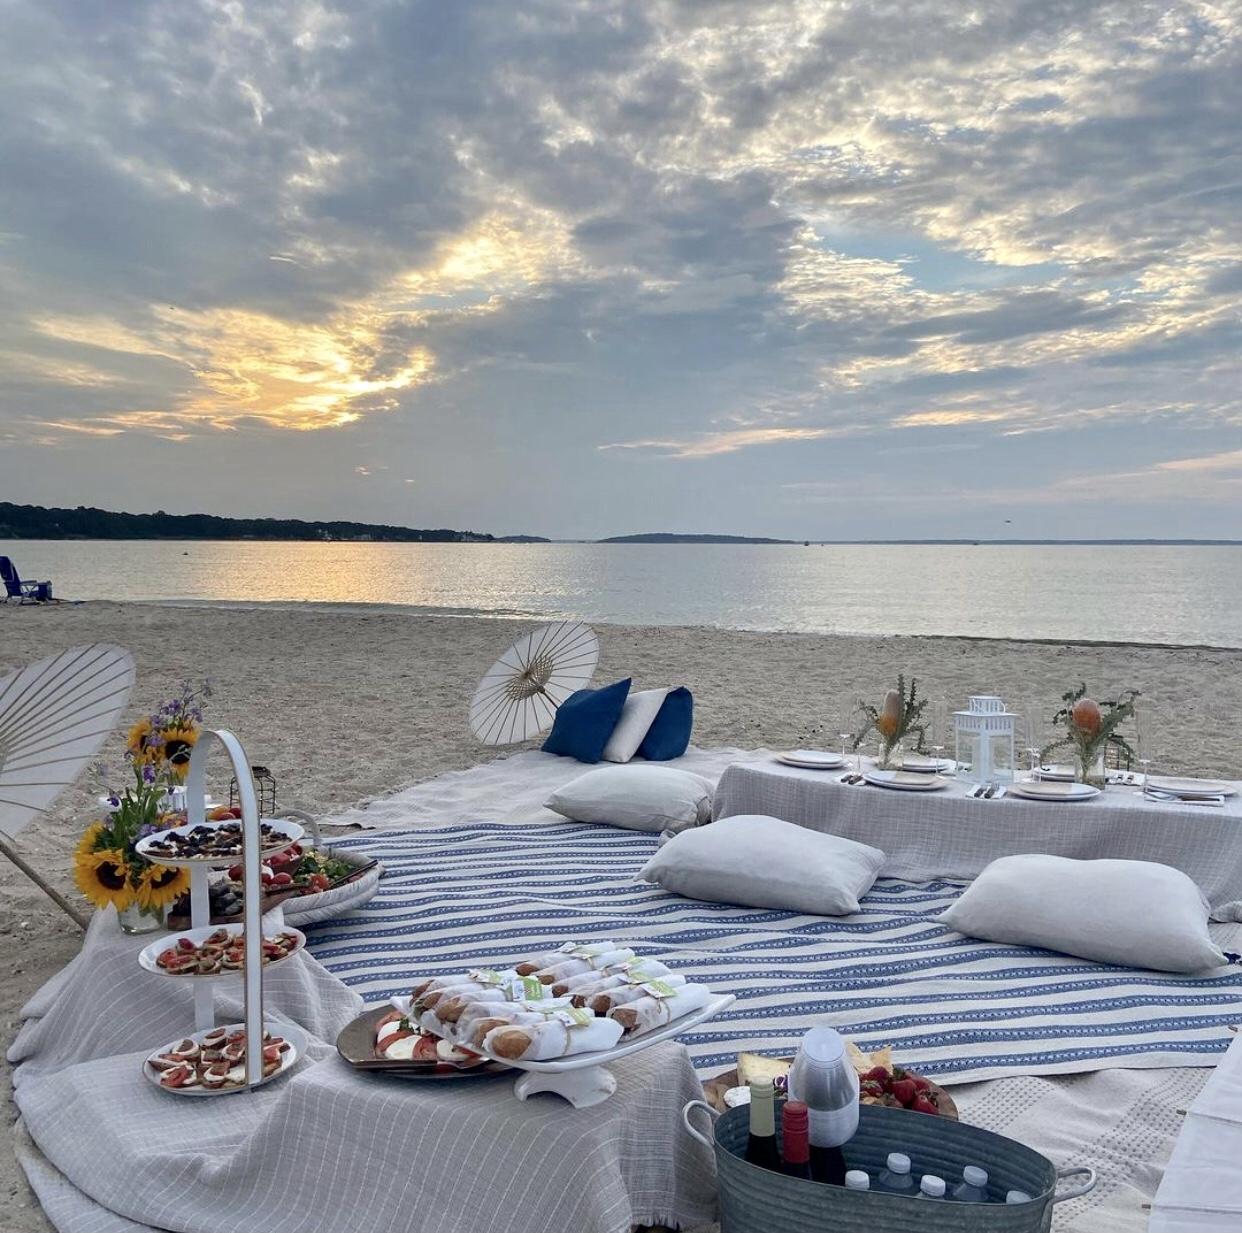 hamptons beach picnic